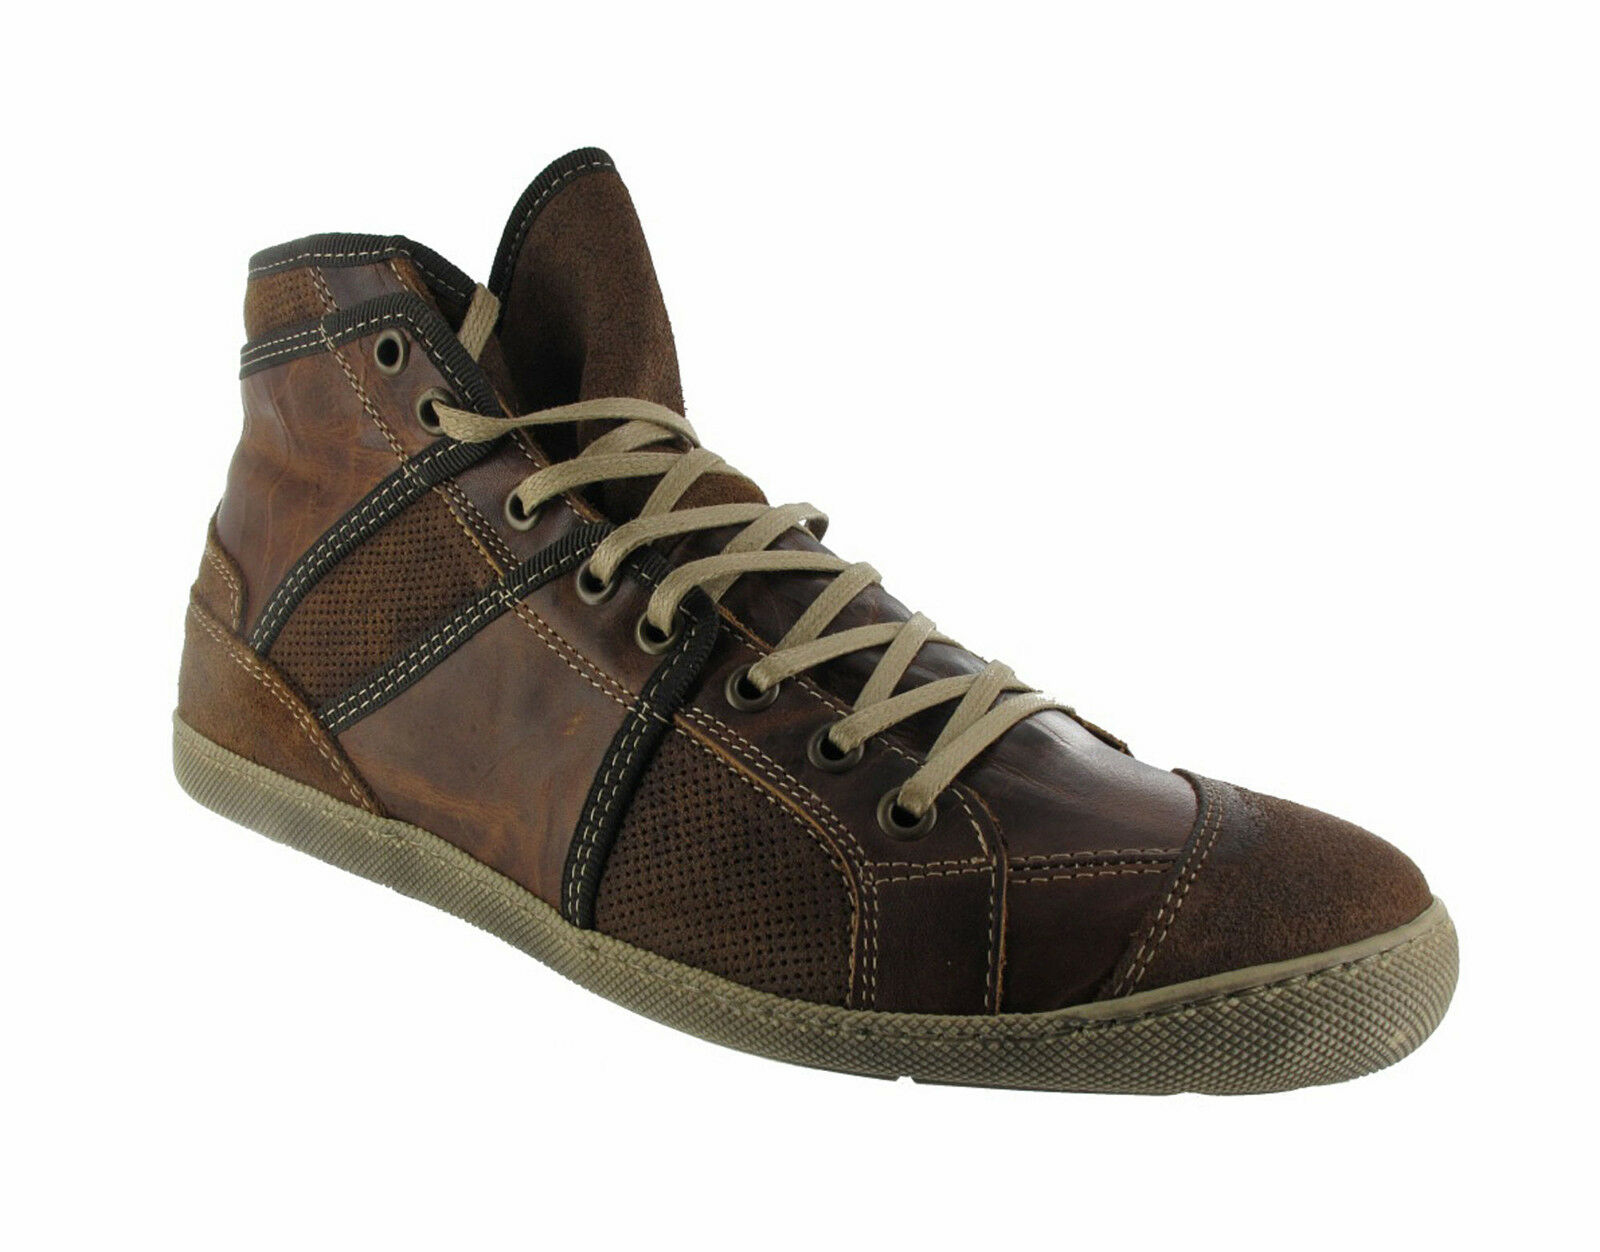 Billig gute braun Qualität Bullboxer Sneaker - braun gute 404K50522A2499SU00 0a7e7f